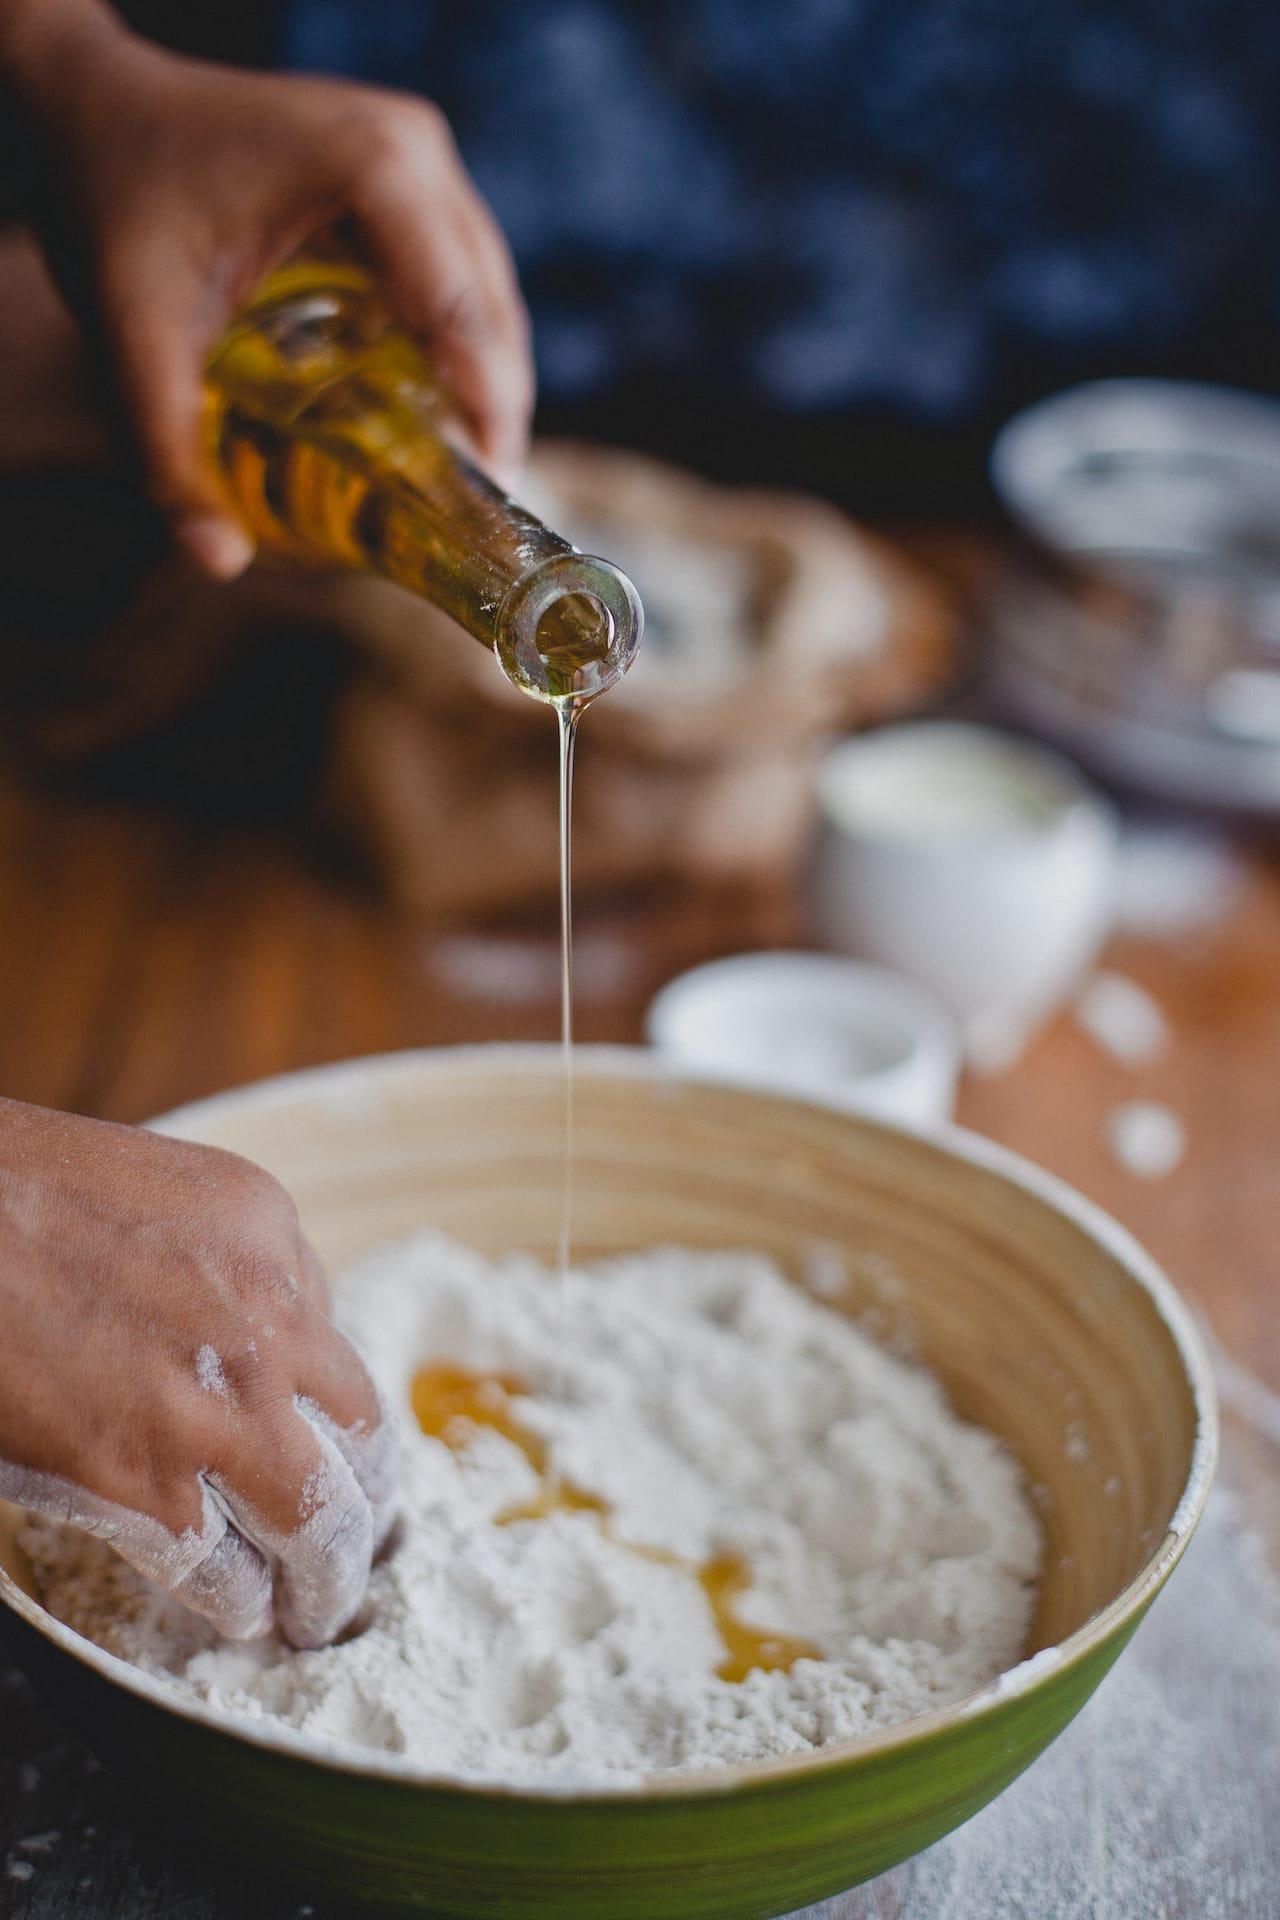 Preparing Instant Naan | Playful Cooking